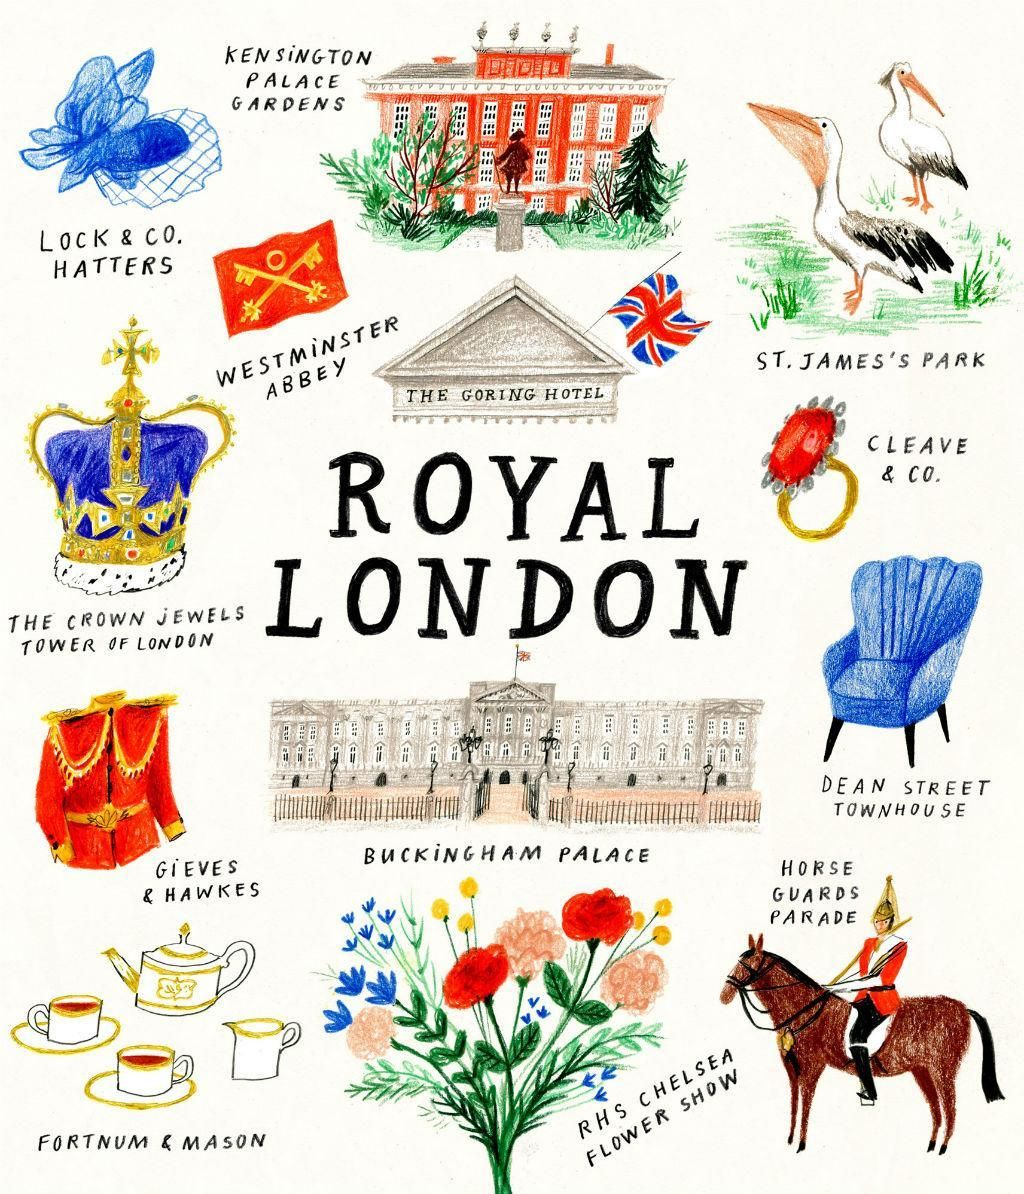 London's Royal locations illustration. Credit: Nina Cosgrove